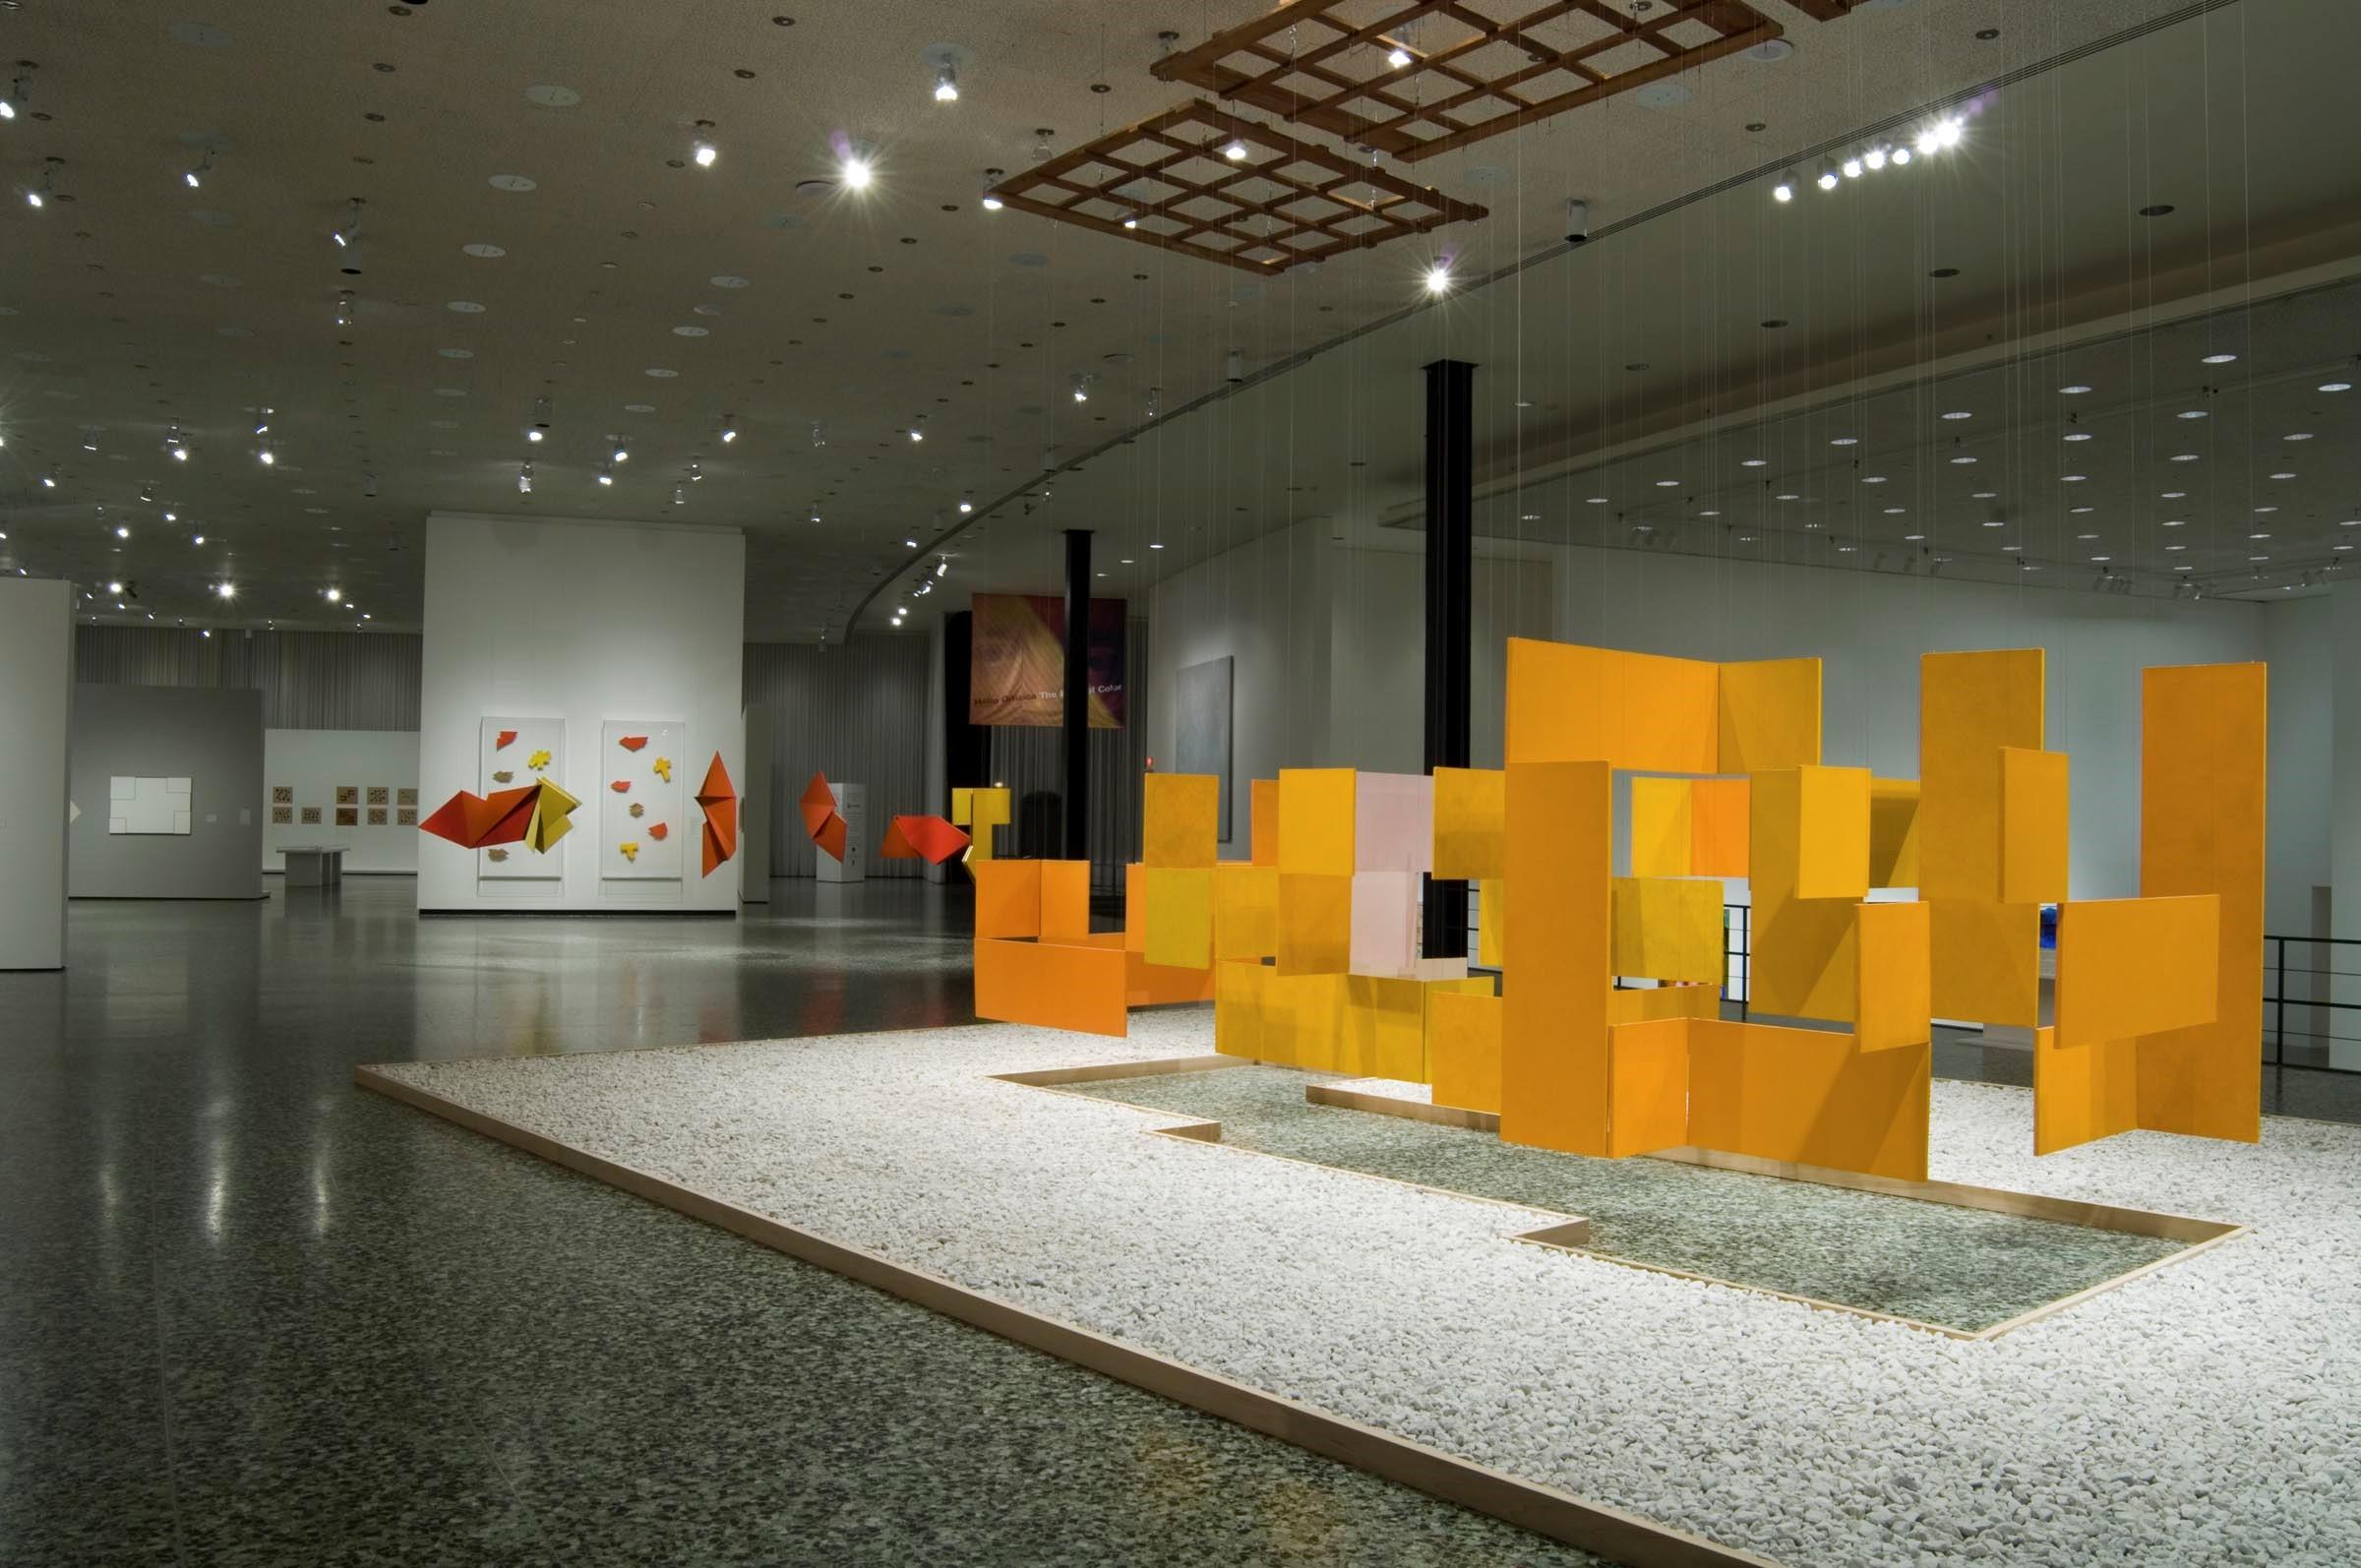 Hélio Oiticica: The Body of Color